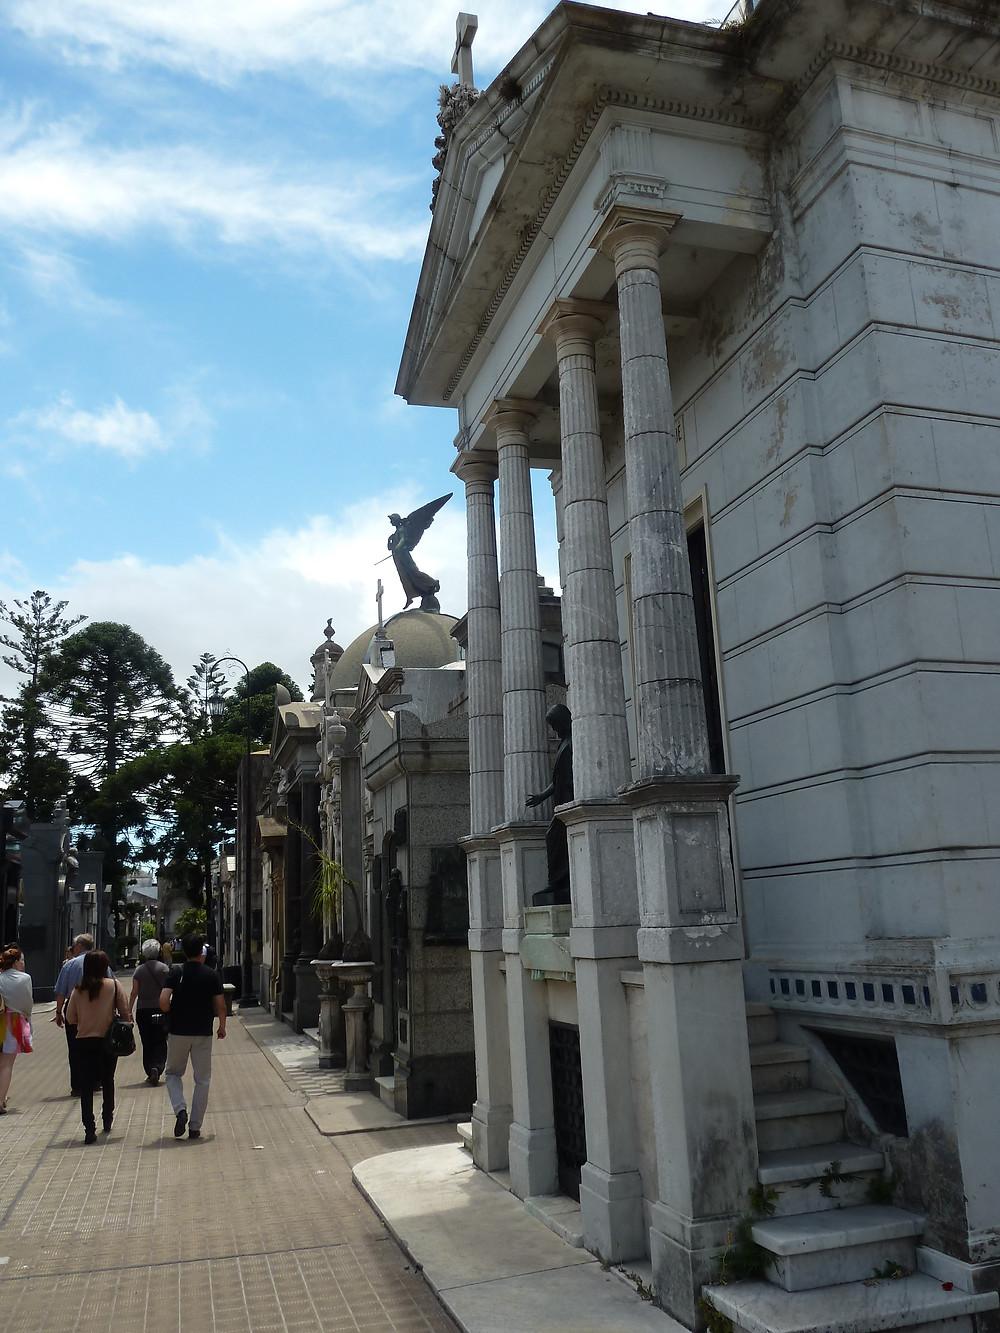 Big tombs of Recoleta Cemetary